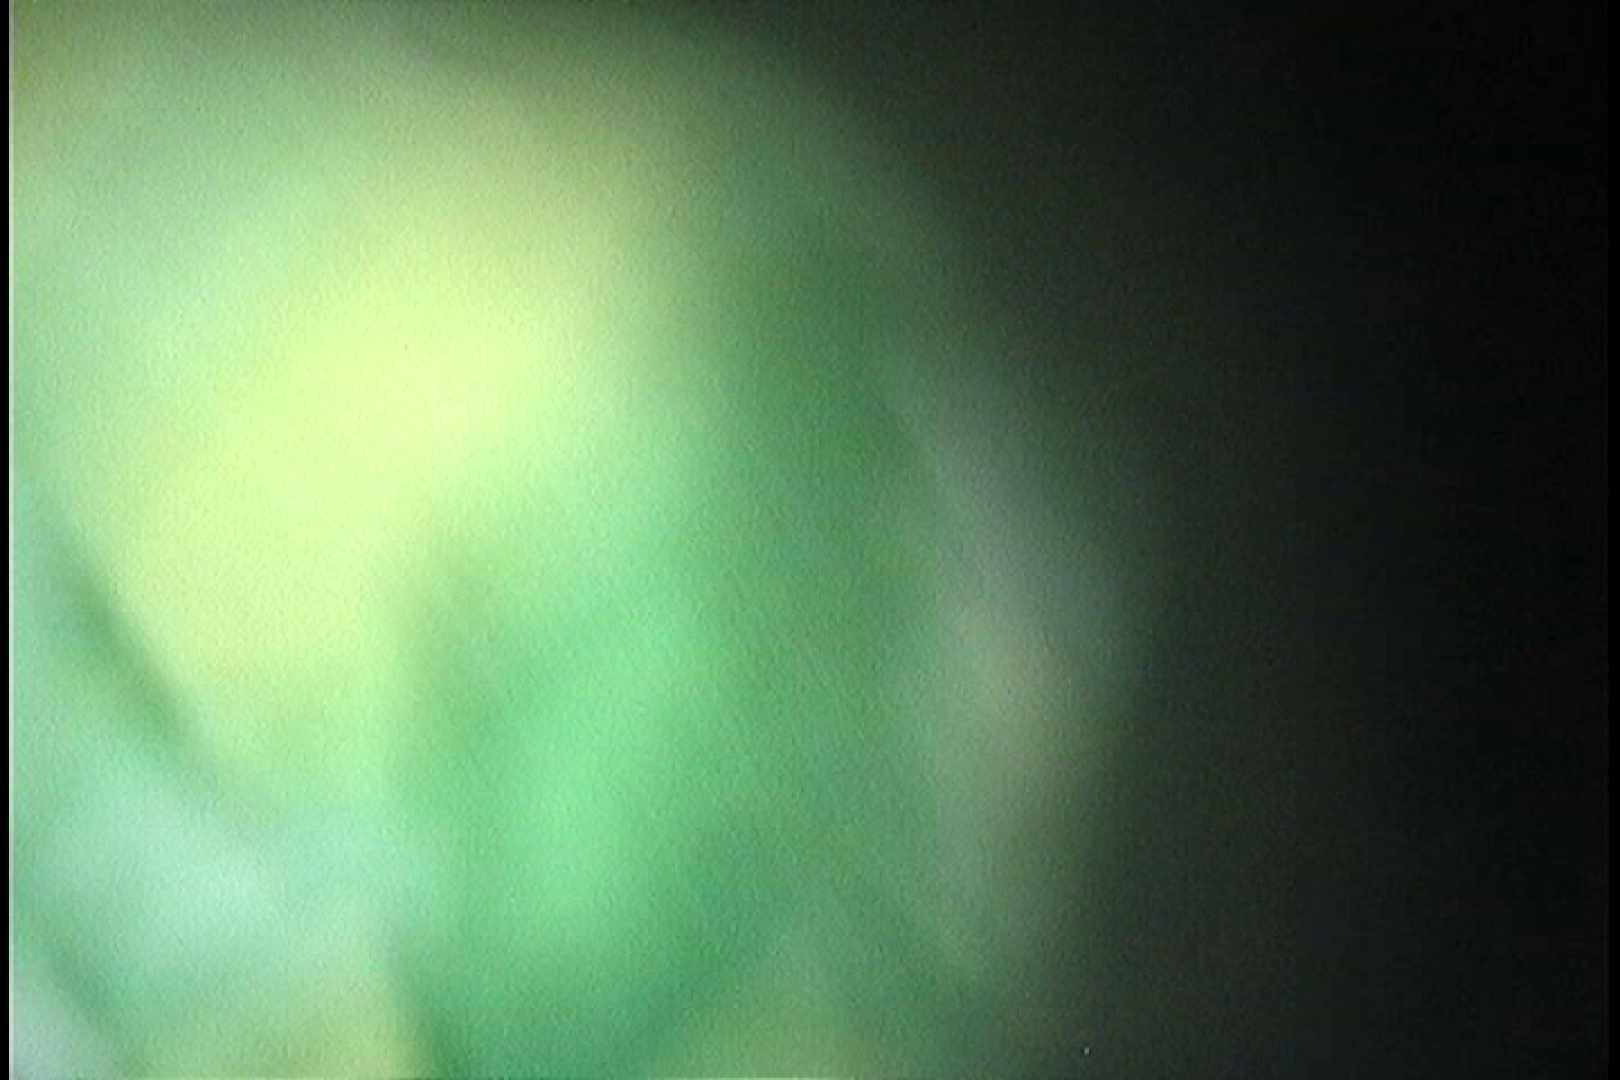 No.22 日焼け跡とオッパイの関係がおかしな貧乳ギャル 接写 セックス画像 77pic 14